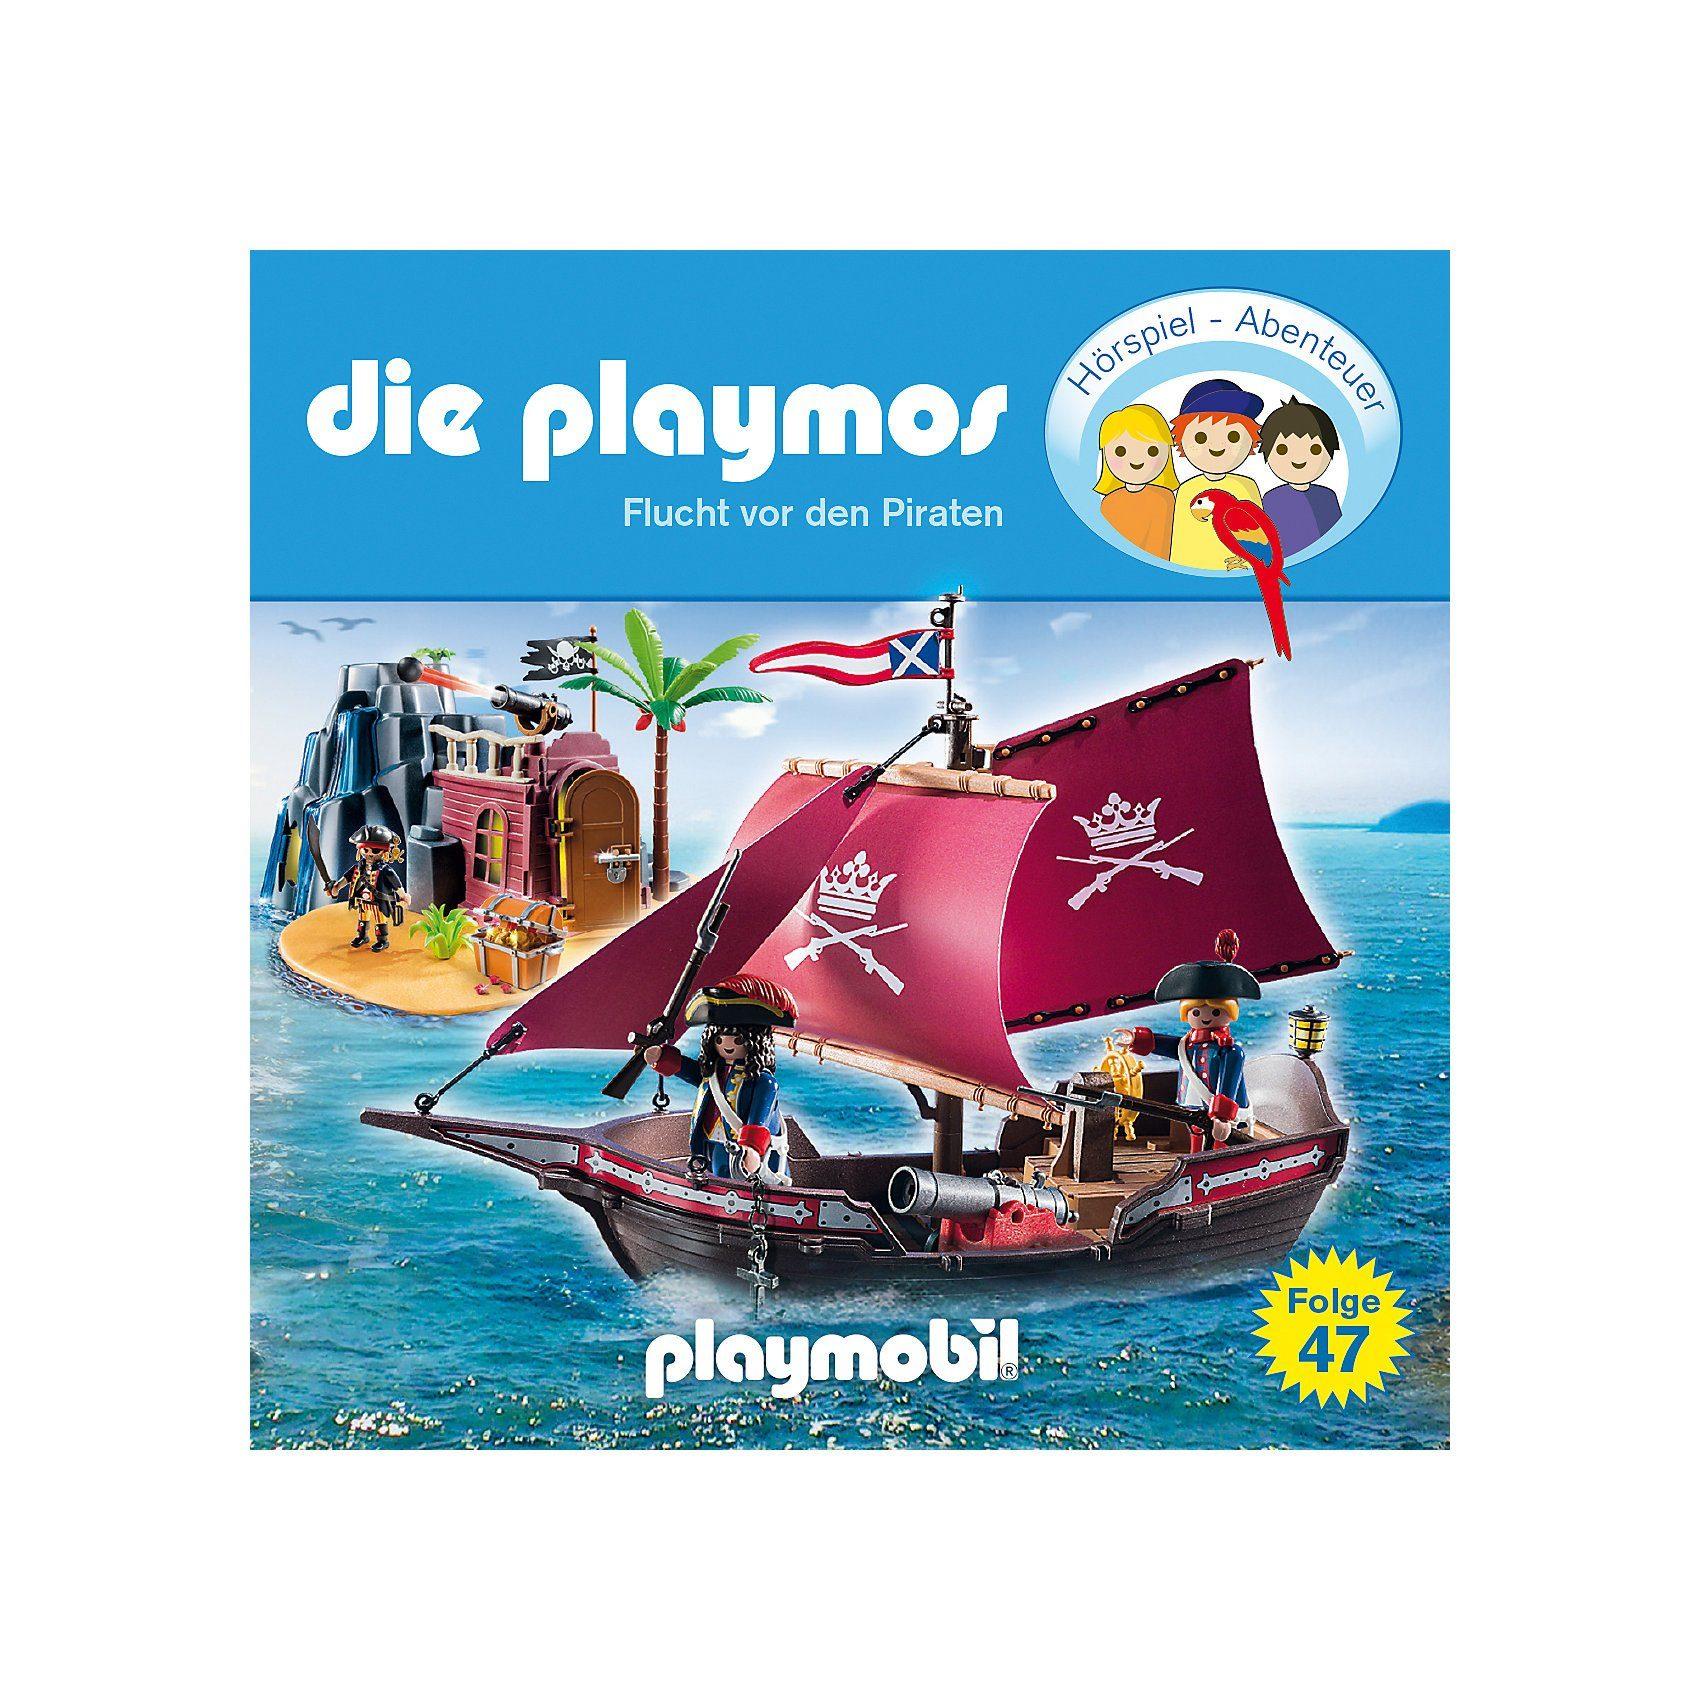 Edel CD Playmos 47